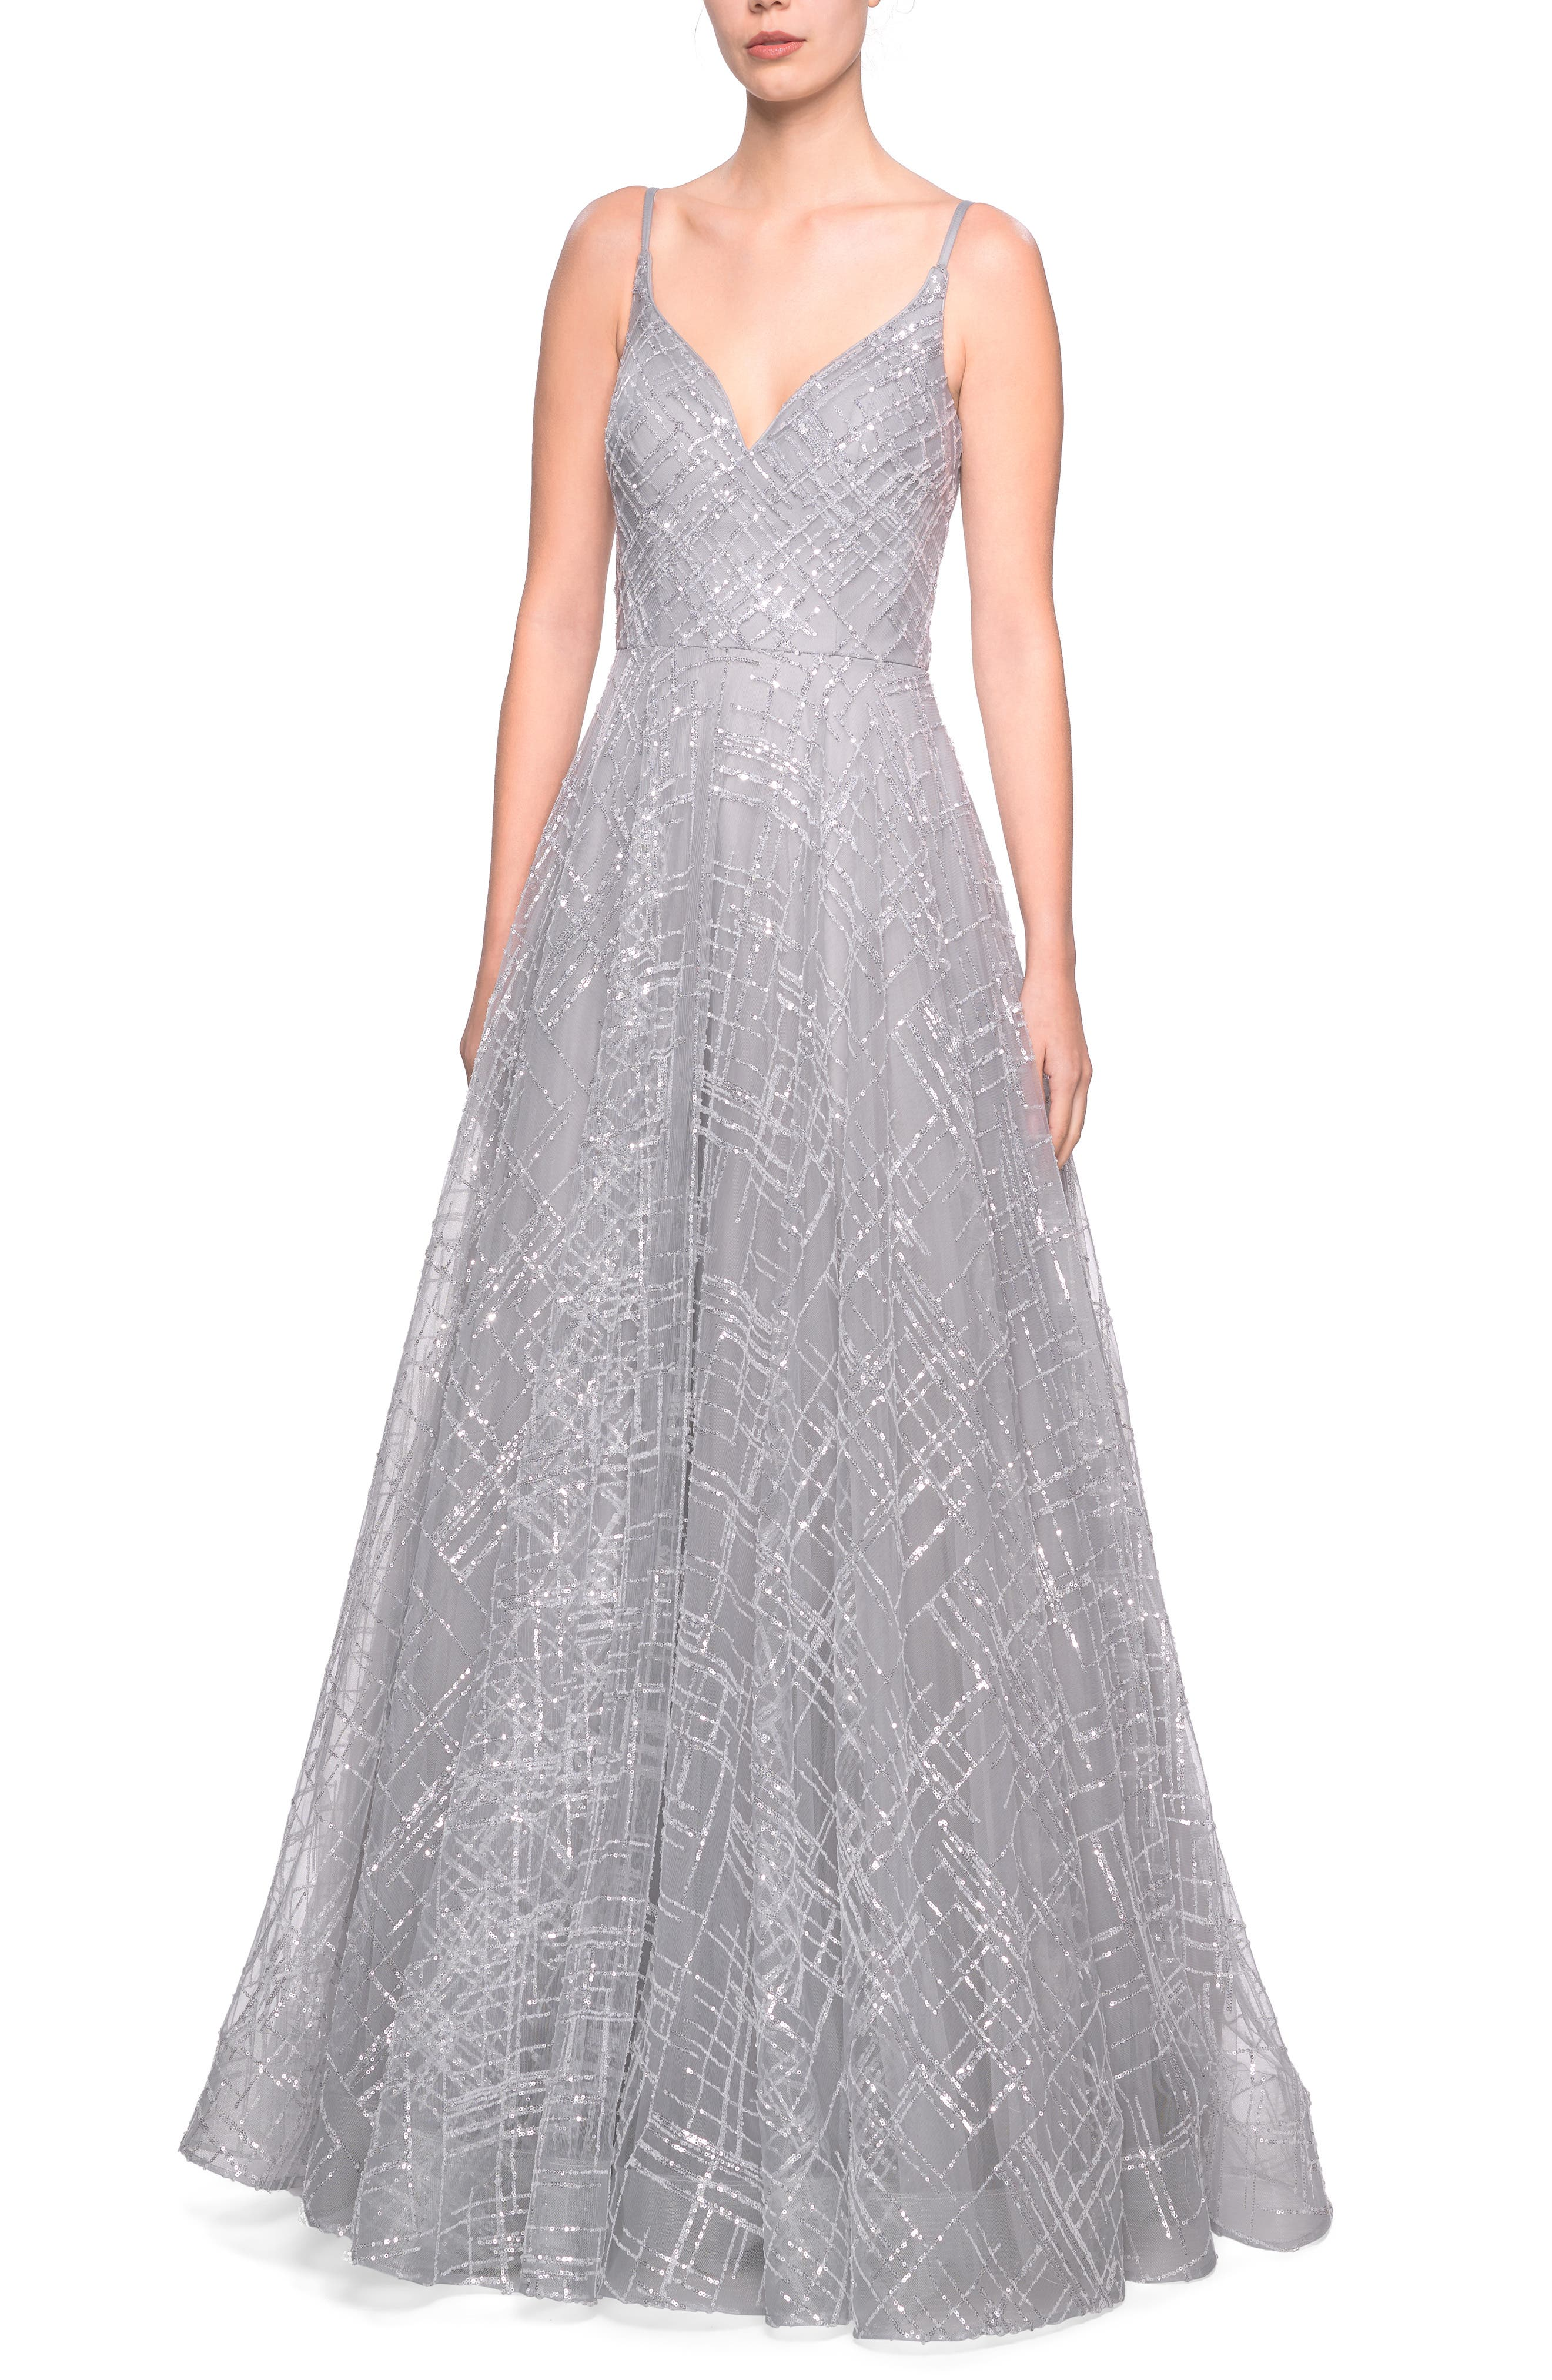 La Femme Sequin Evening Dress, Grey